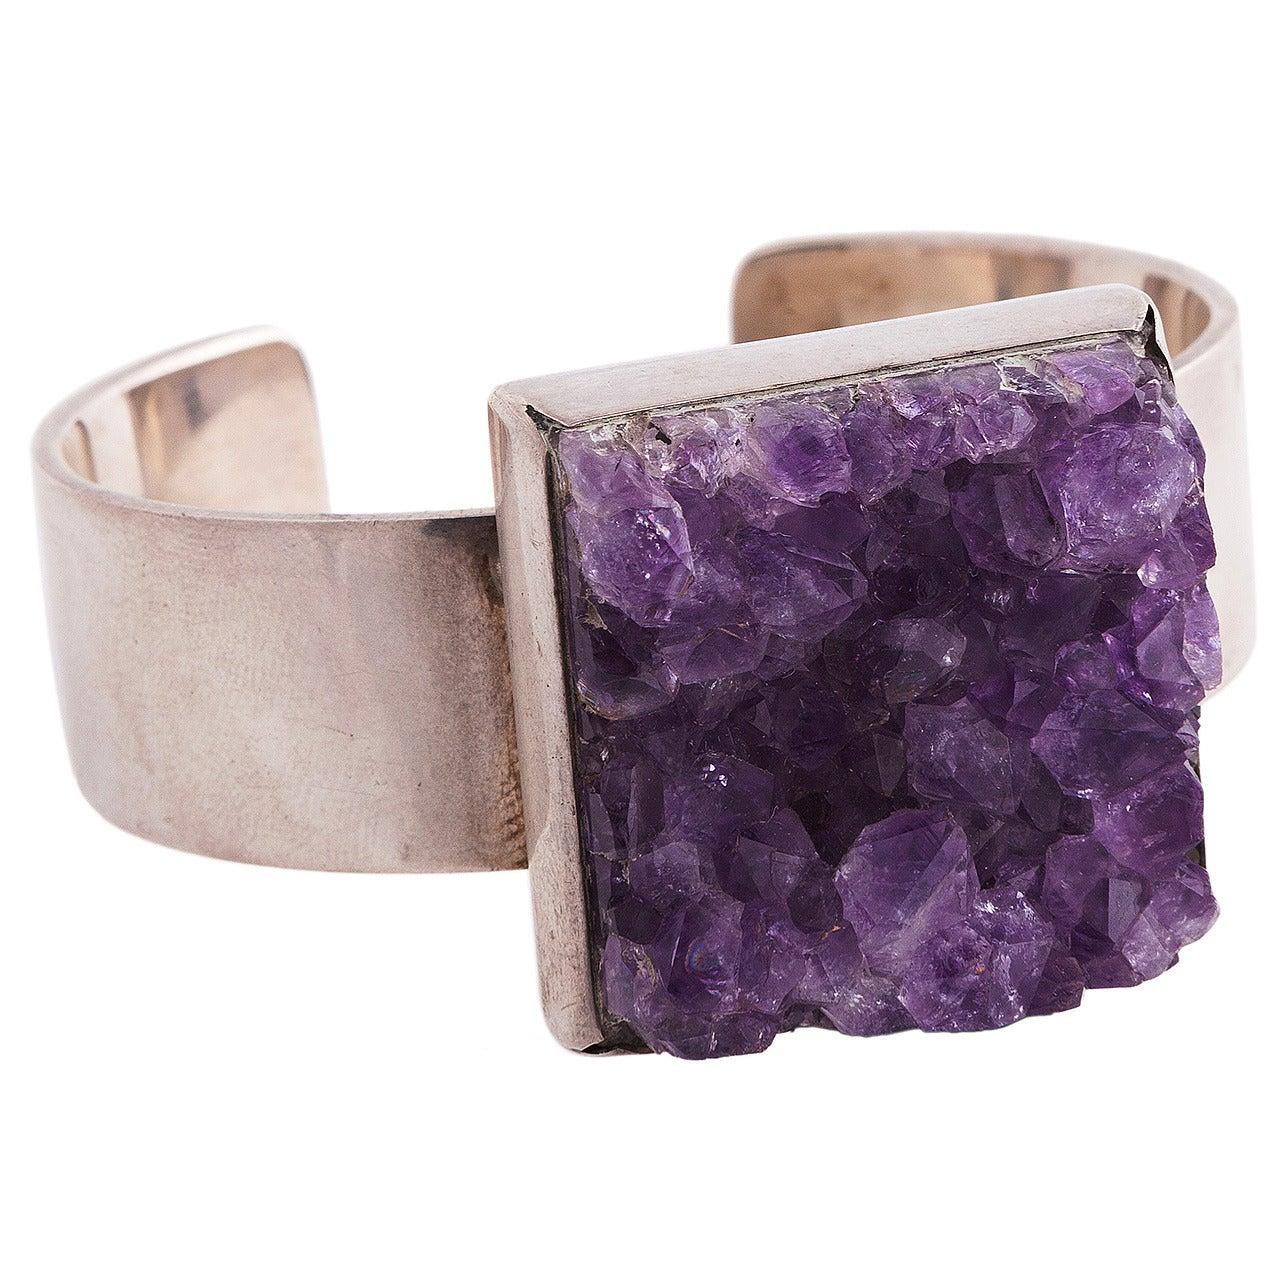 Sterling Silver and Amethyst Bracelet by Bent Knudsen